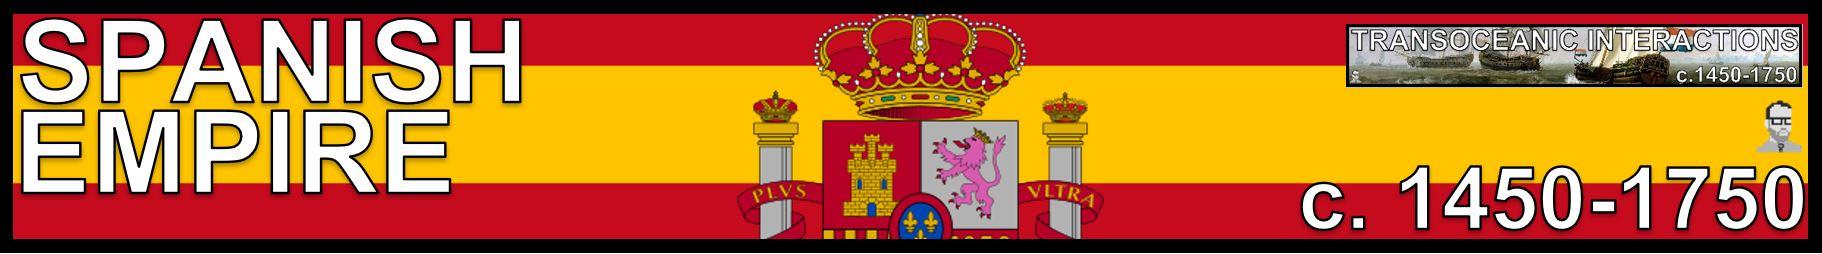 SPANISH FLAG AP WORLD HISTORY MODERN FREEMANPEDIA TRANSOCEANIC INTERACTIONS.JPG